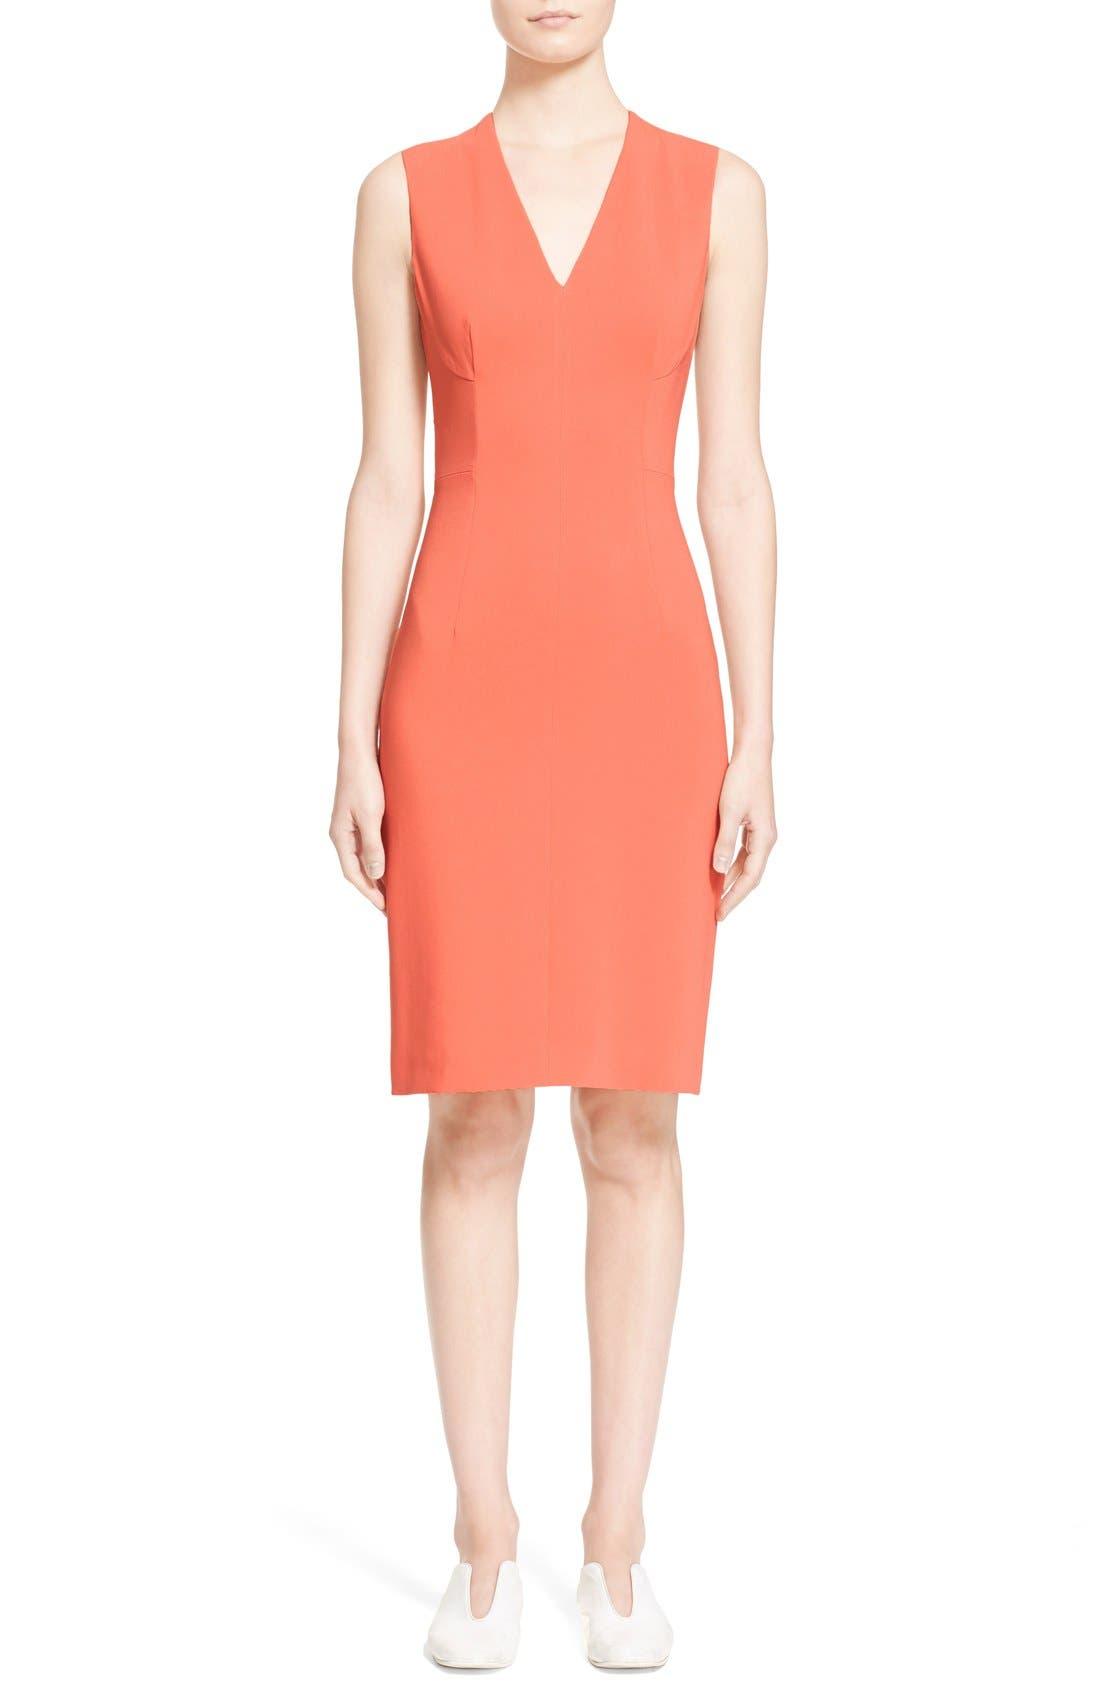 Alternate Image 1 Selected - Stella McCartney 'Simona' Sleeveless V-Neck Dress